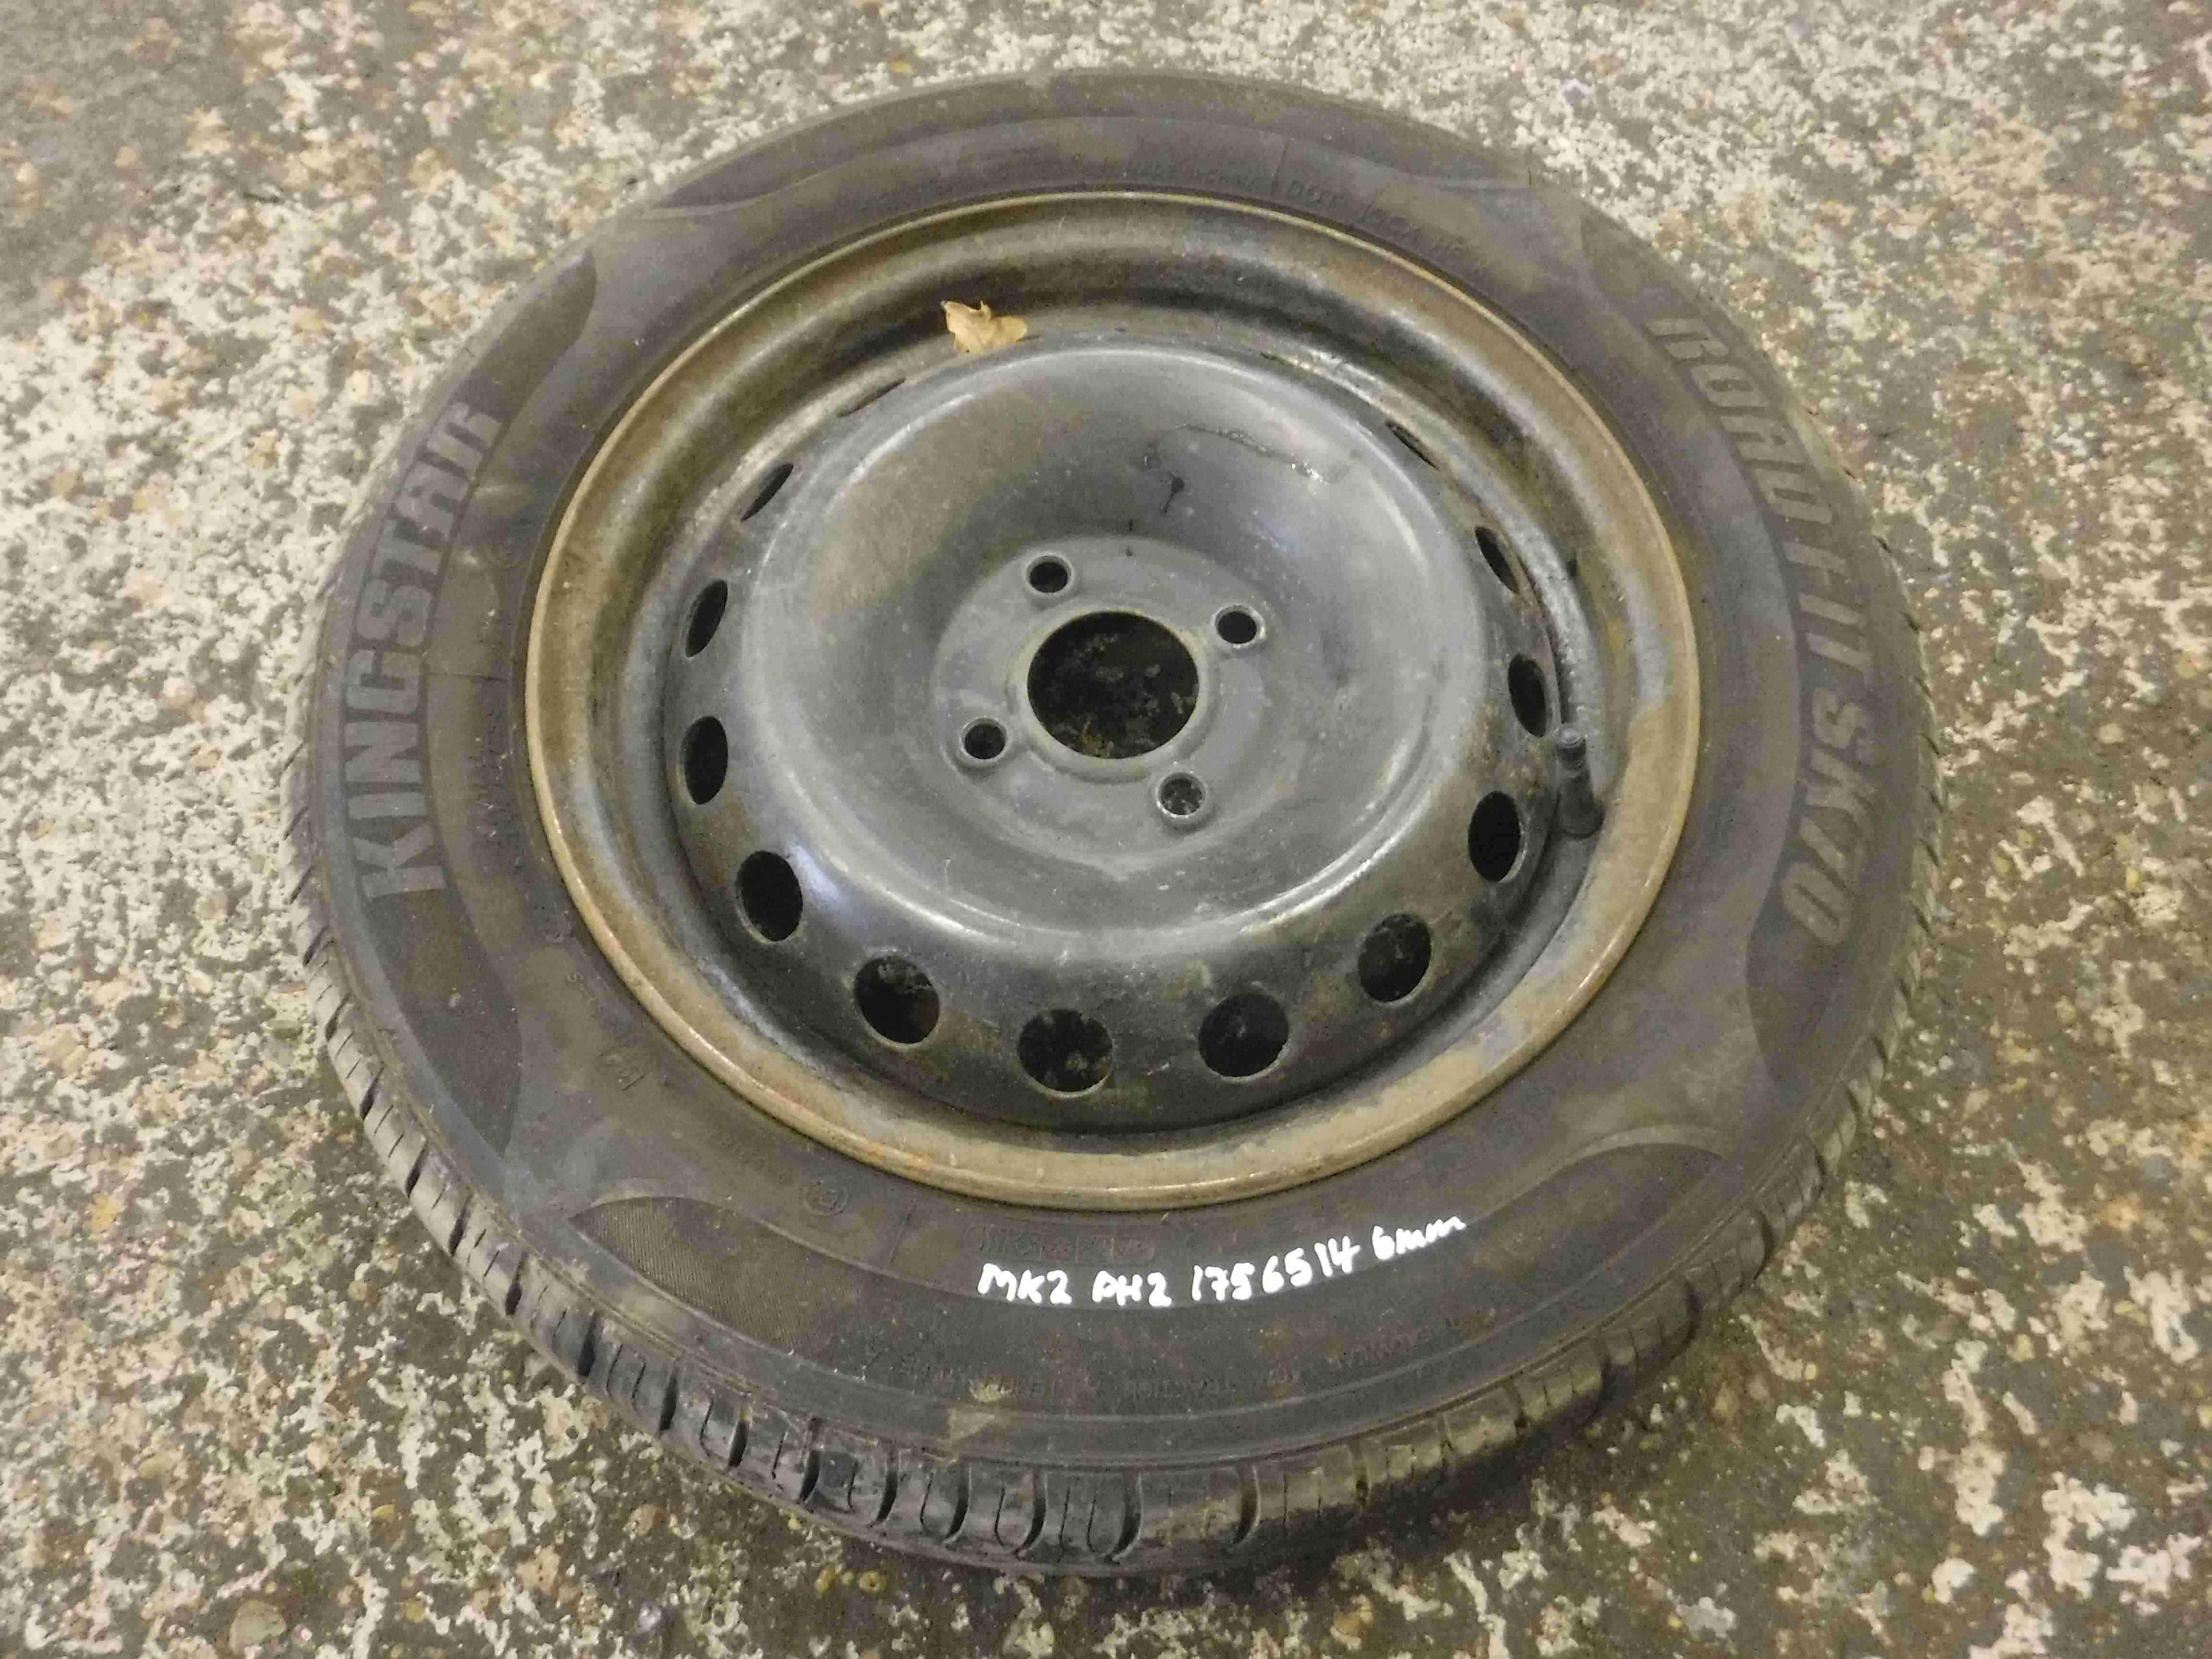 Renault Clio MK2 2001-2006 Steel Wheel Rim + Tyre 175 65 14 6mm Tread 3/5